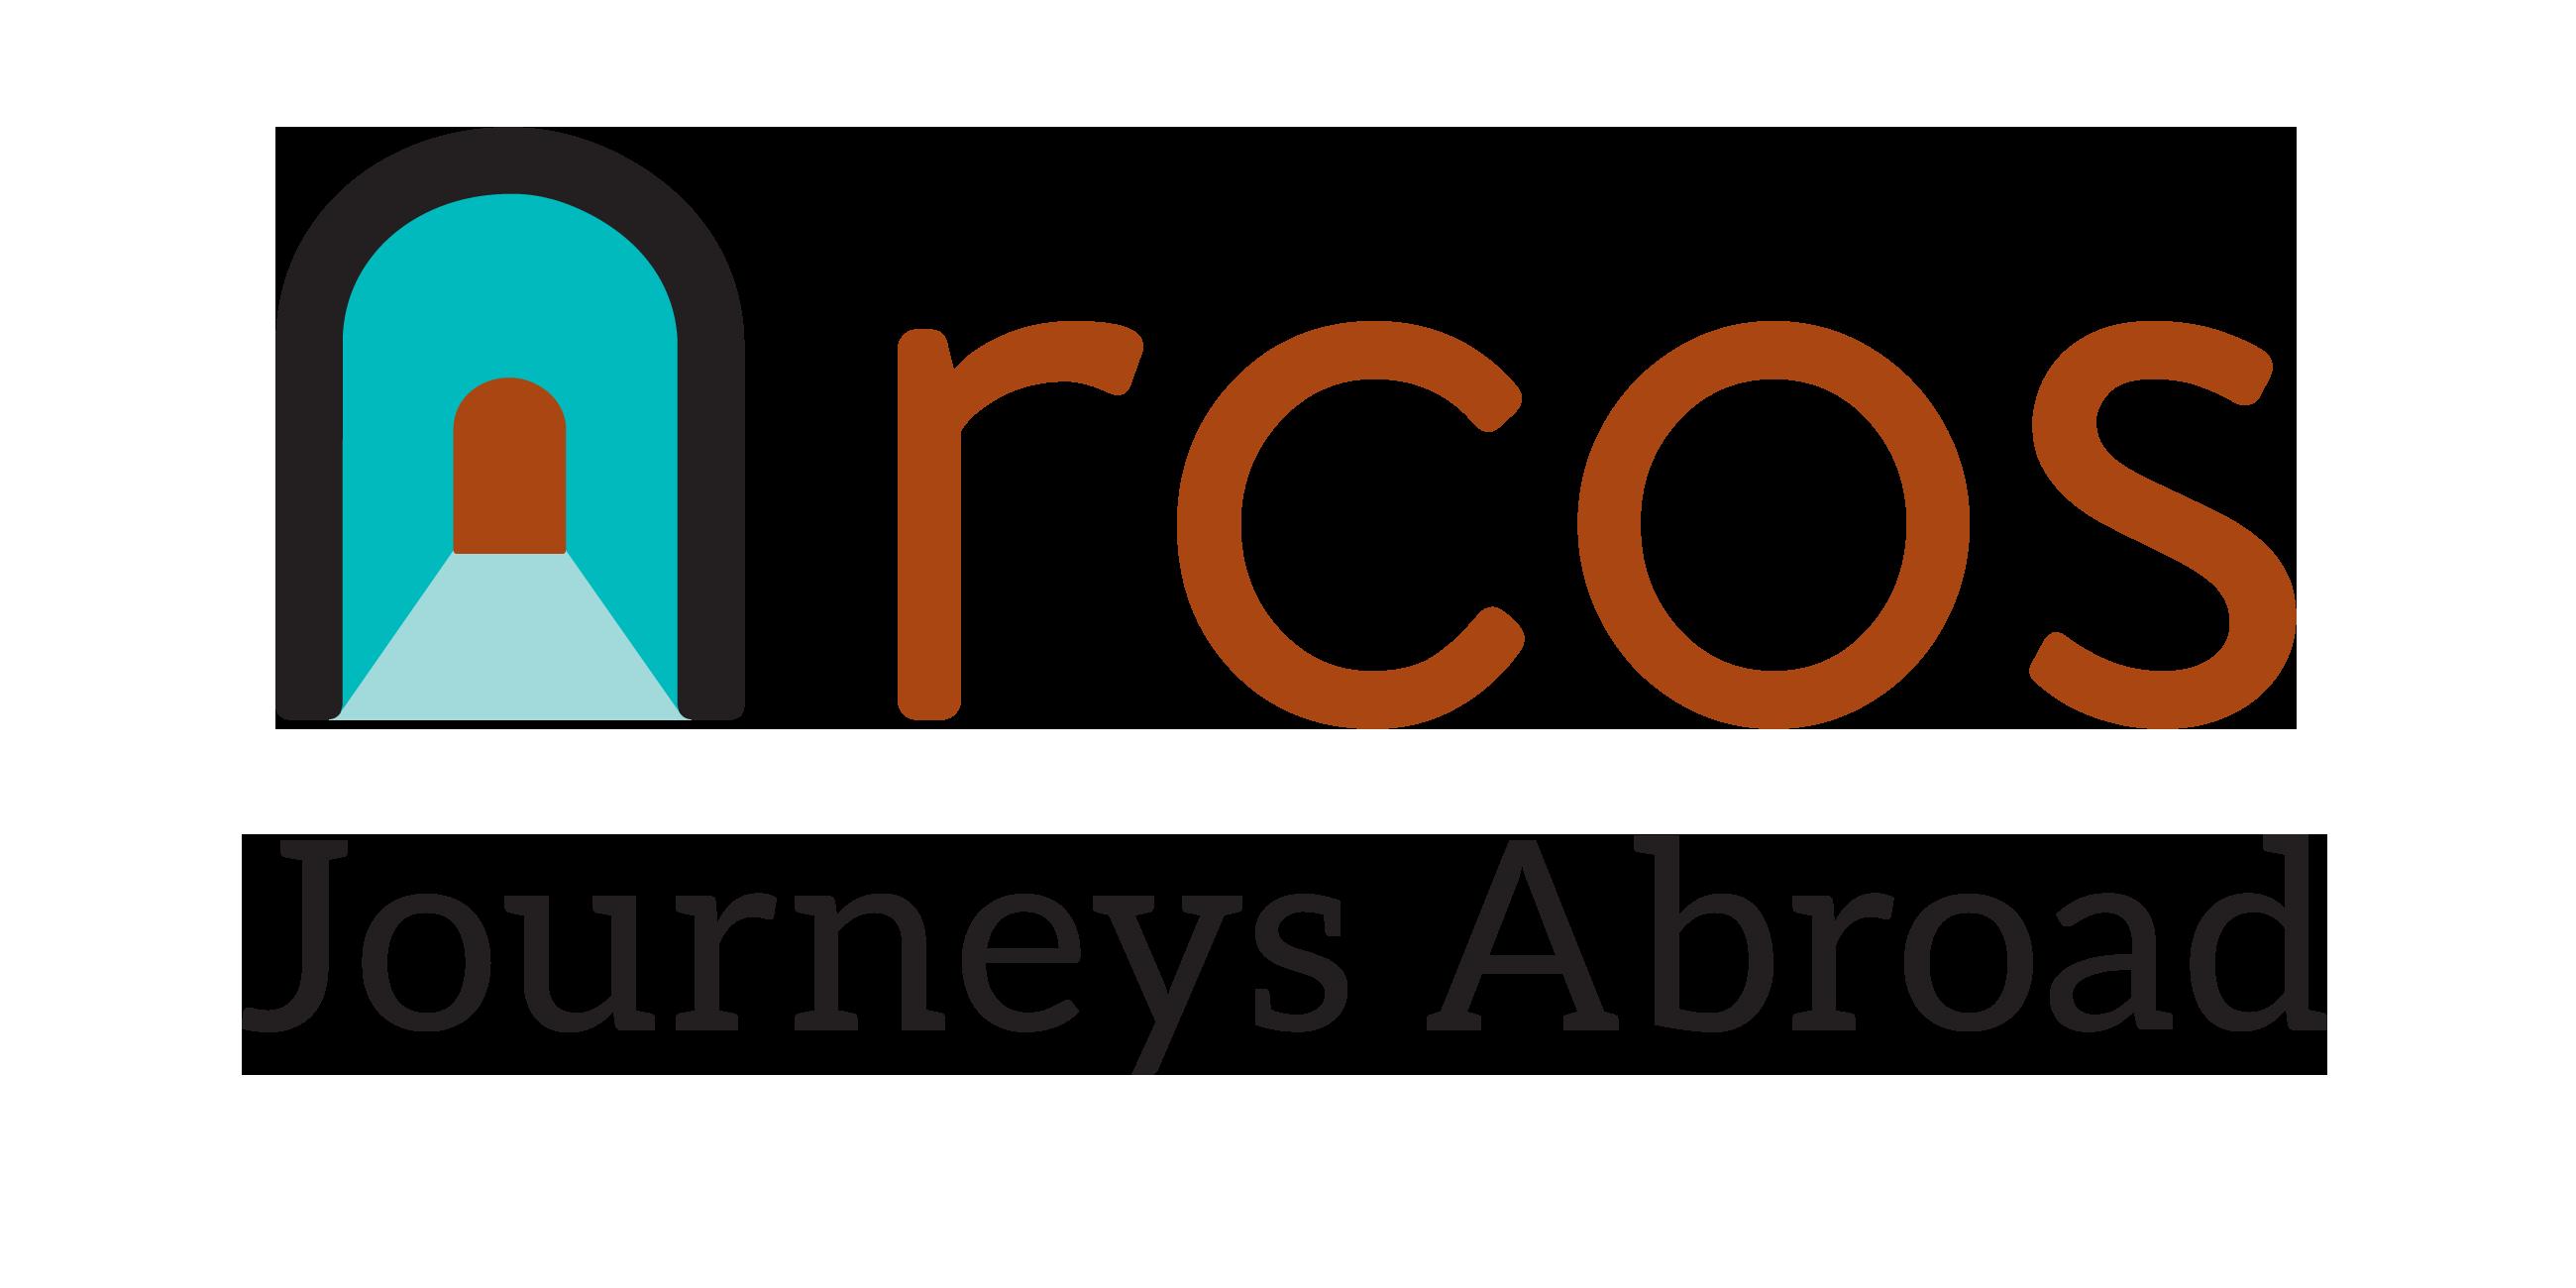 Arcos Journeys: Urban Recycling, Rural School Volunteer, & Iguazu Falls